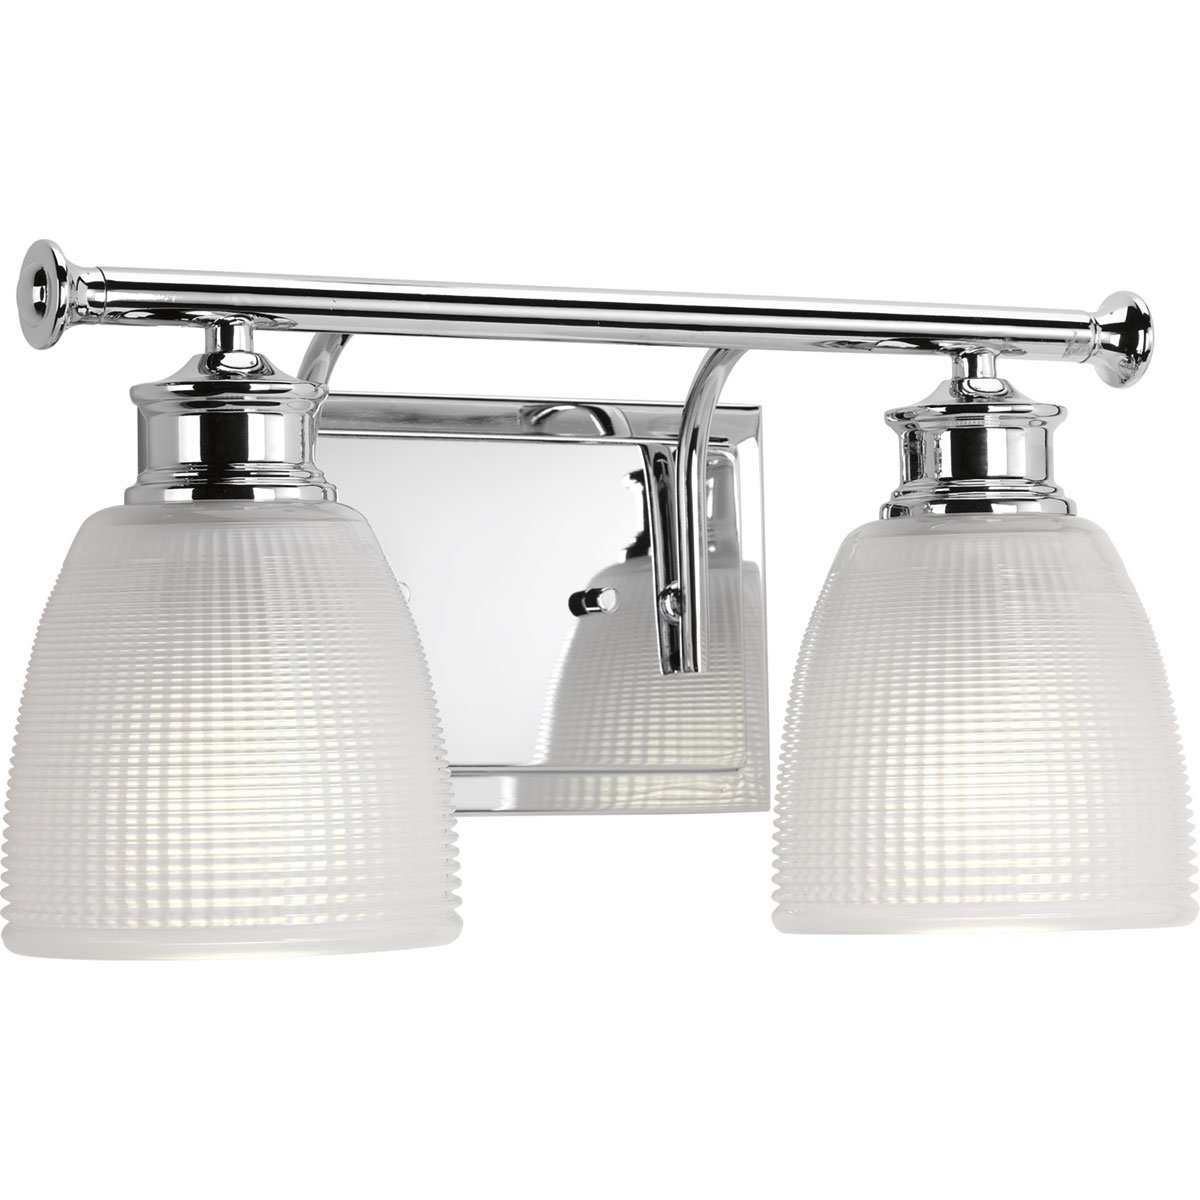 chrome bathroom light fixtures. Chrome Bathroom Light Fixtures H